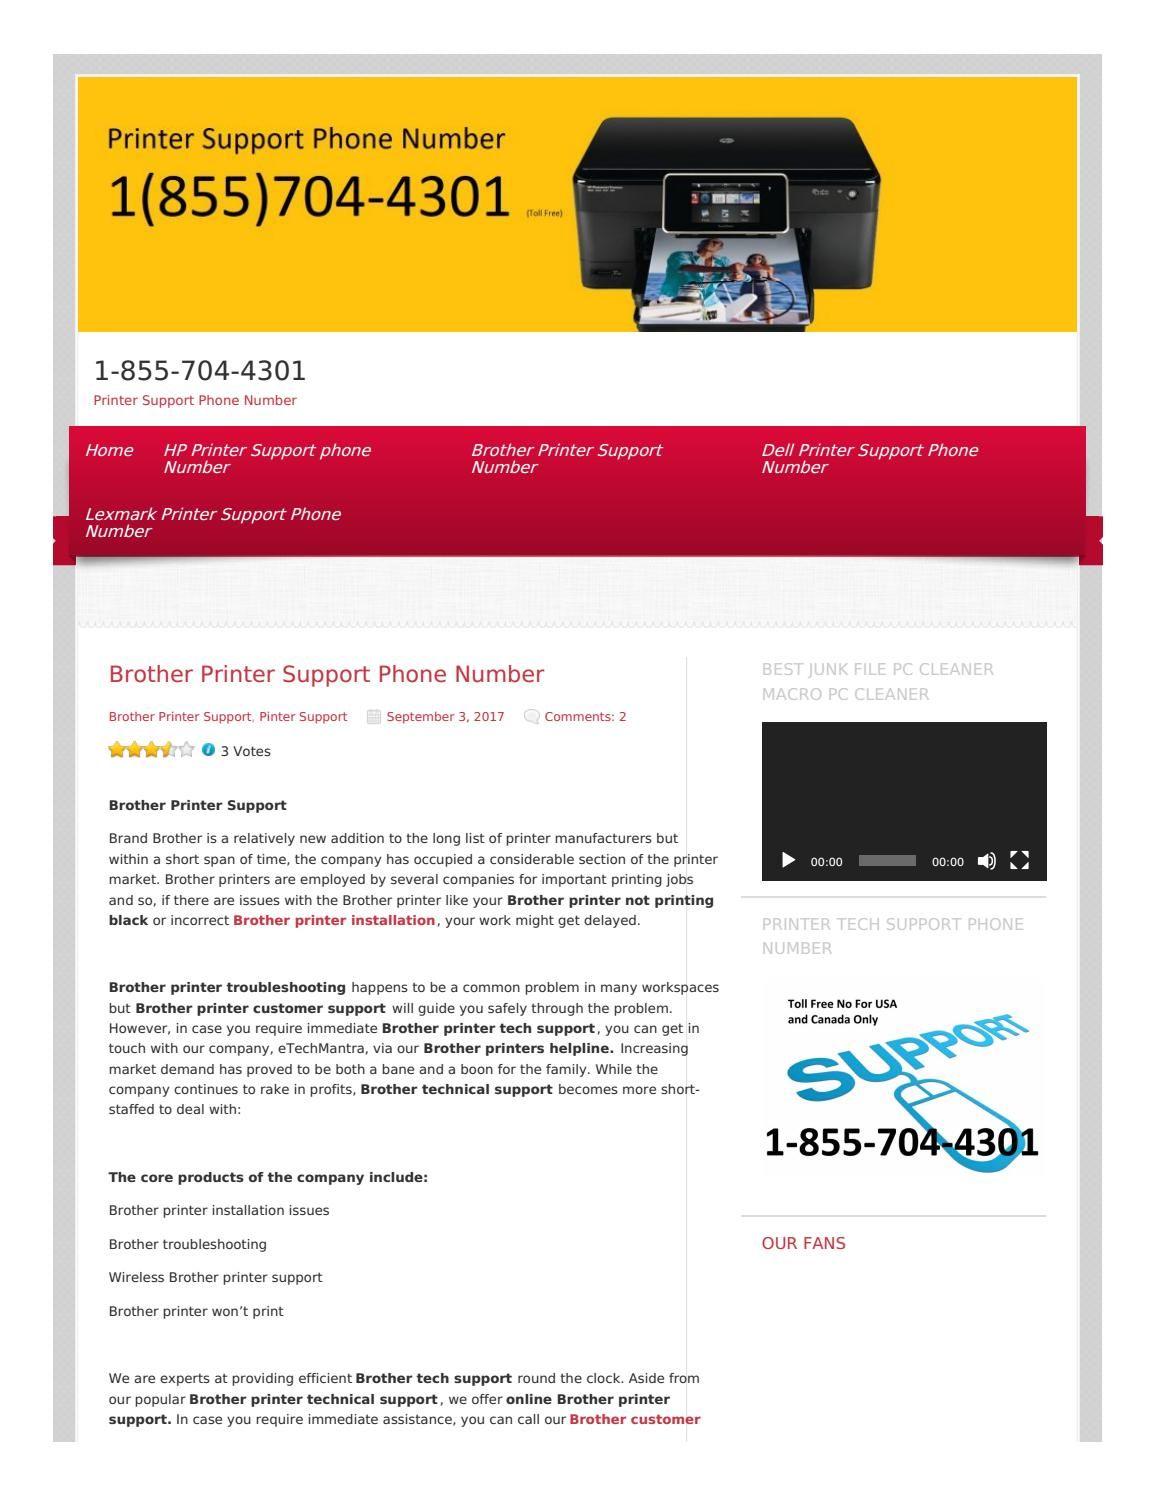 Printer Support Phone Number 1 855 704 4301 Printer Phone